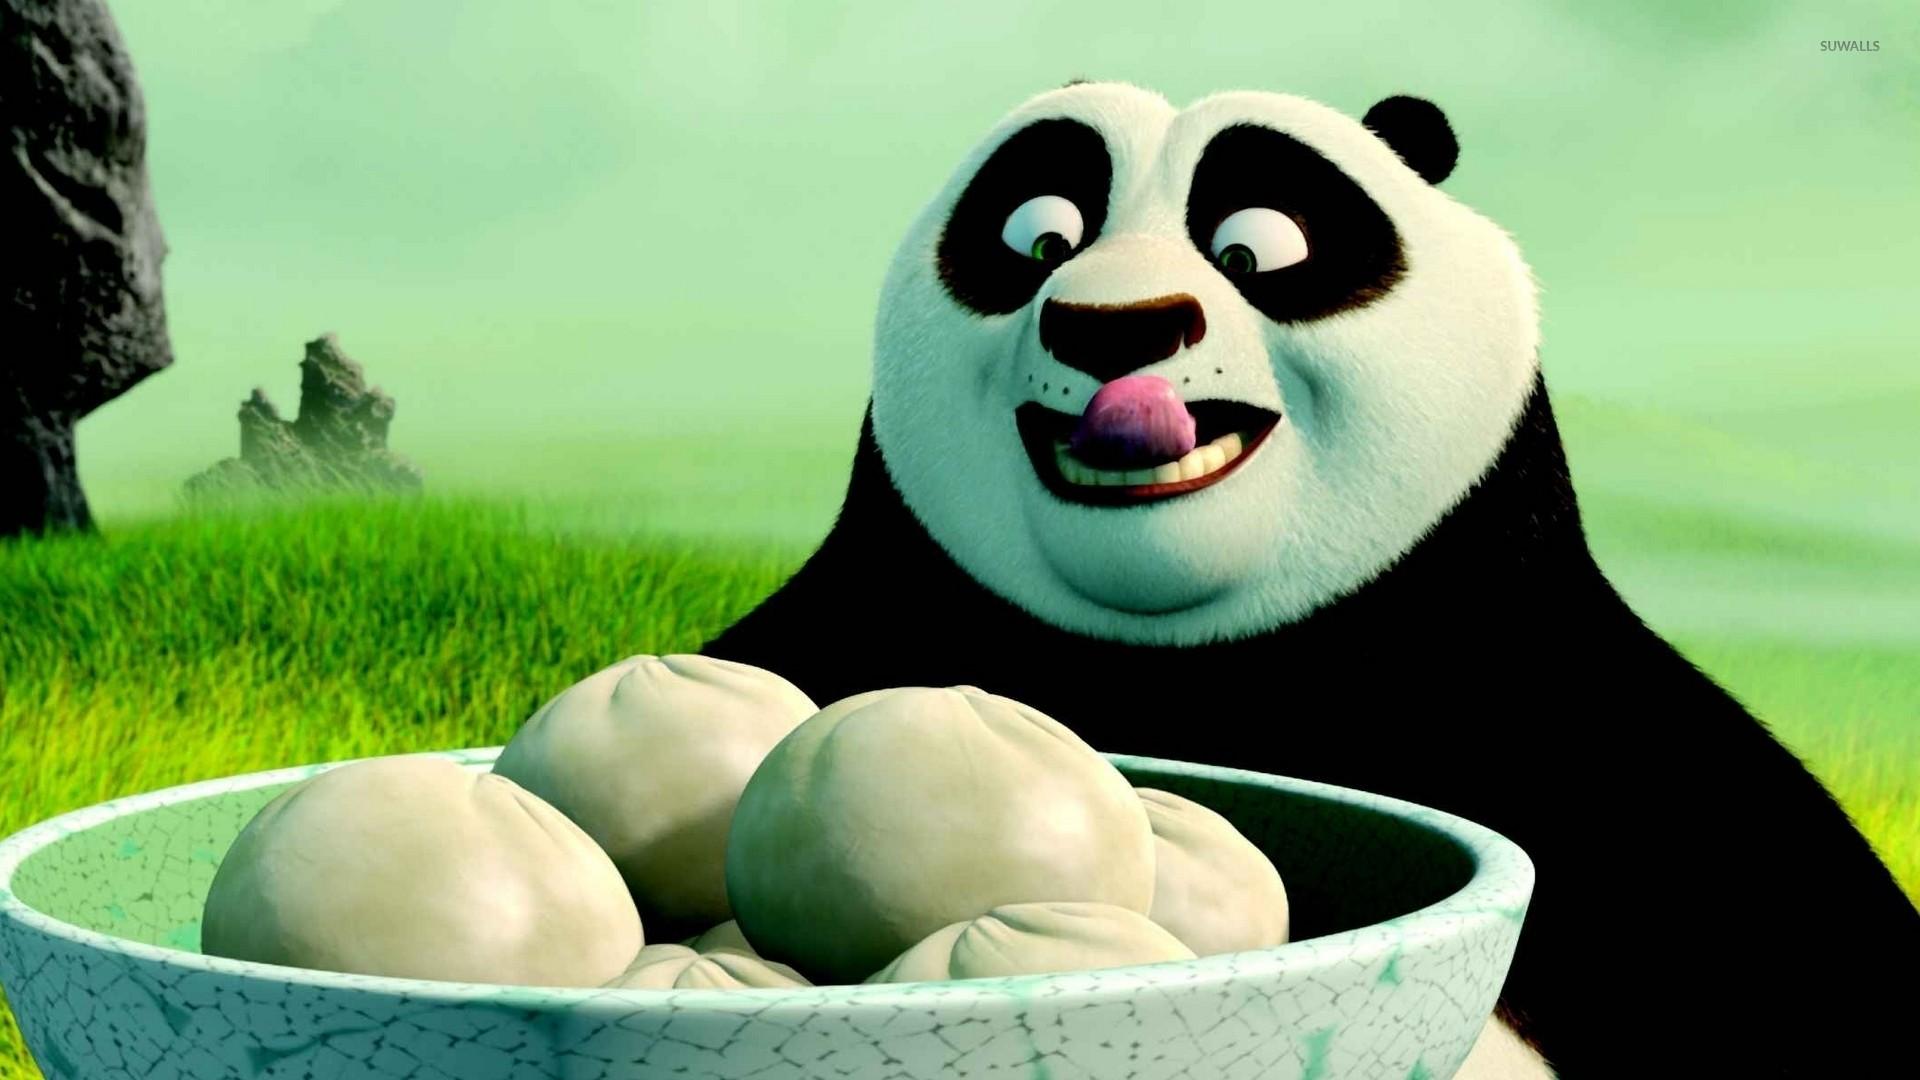 Po having dumplings – Kung Fu Panda wallpaper jpg